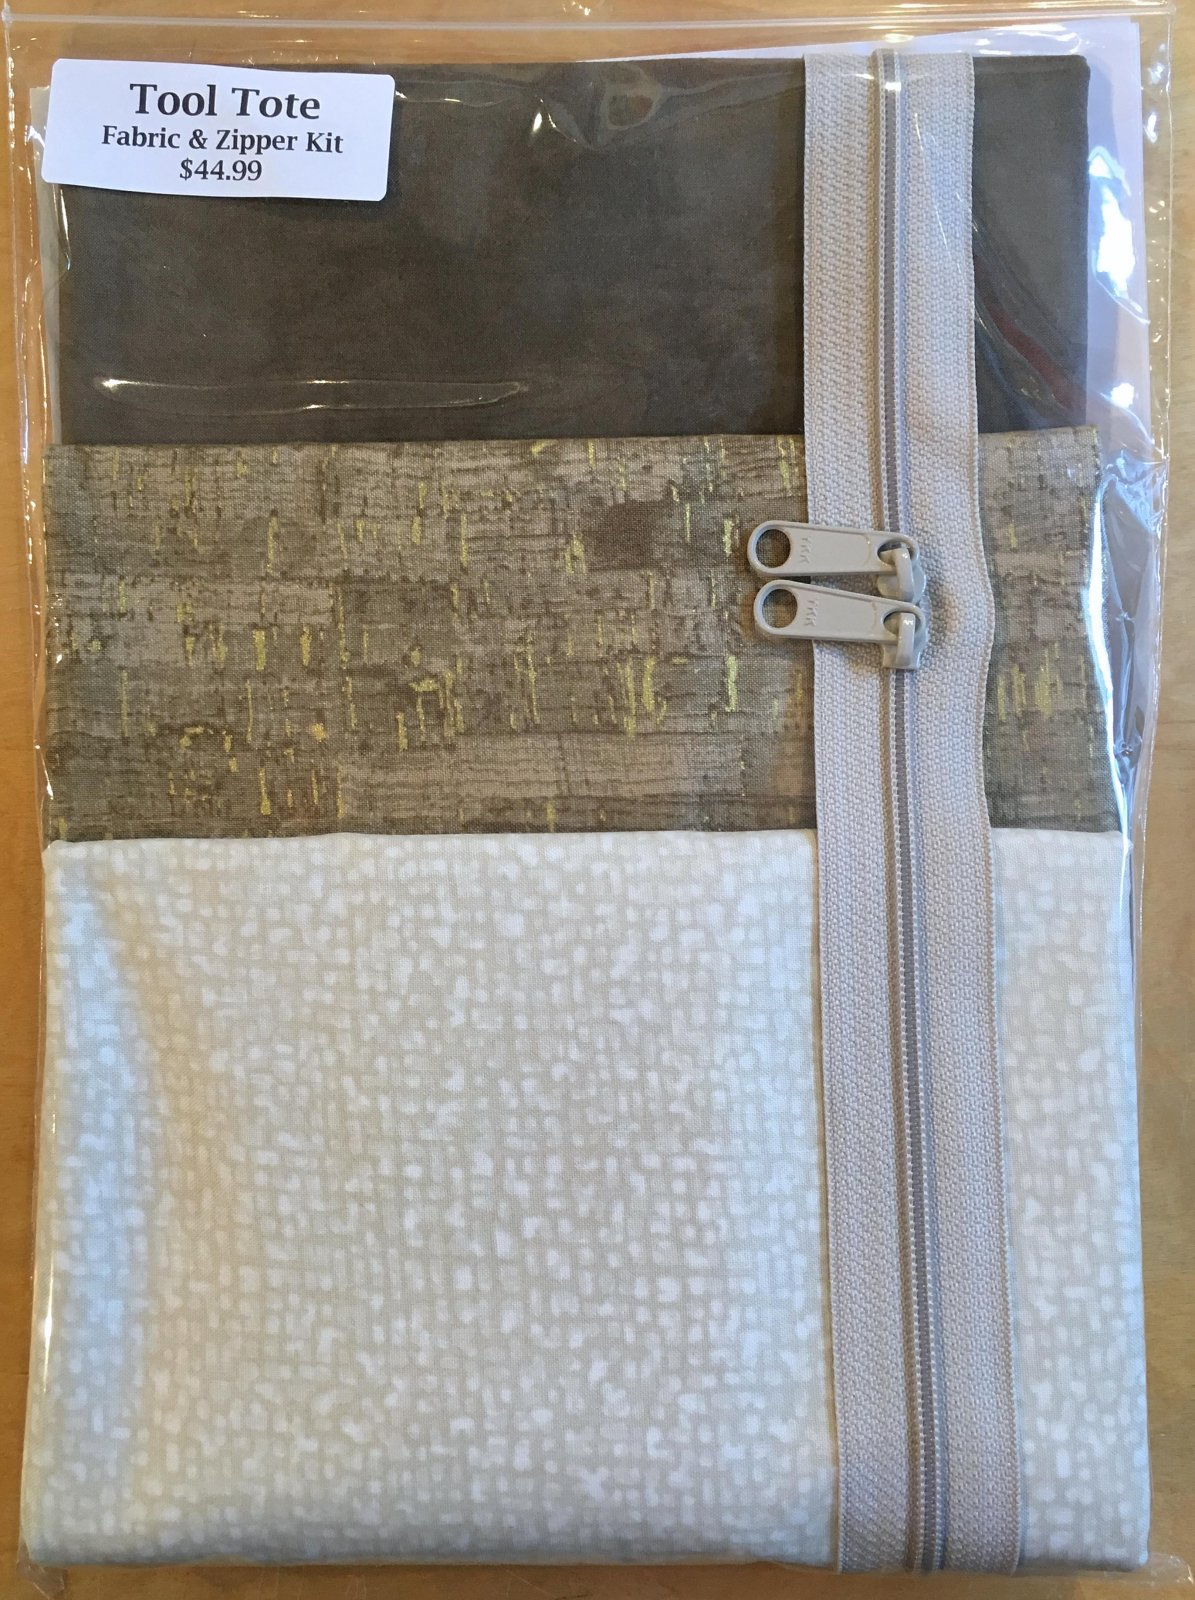 Tool Tote Tan Trio - Fabric & Zipper Kit ONLY